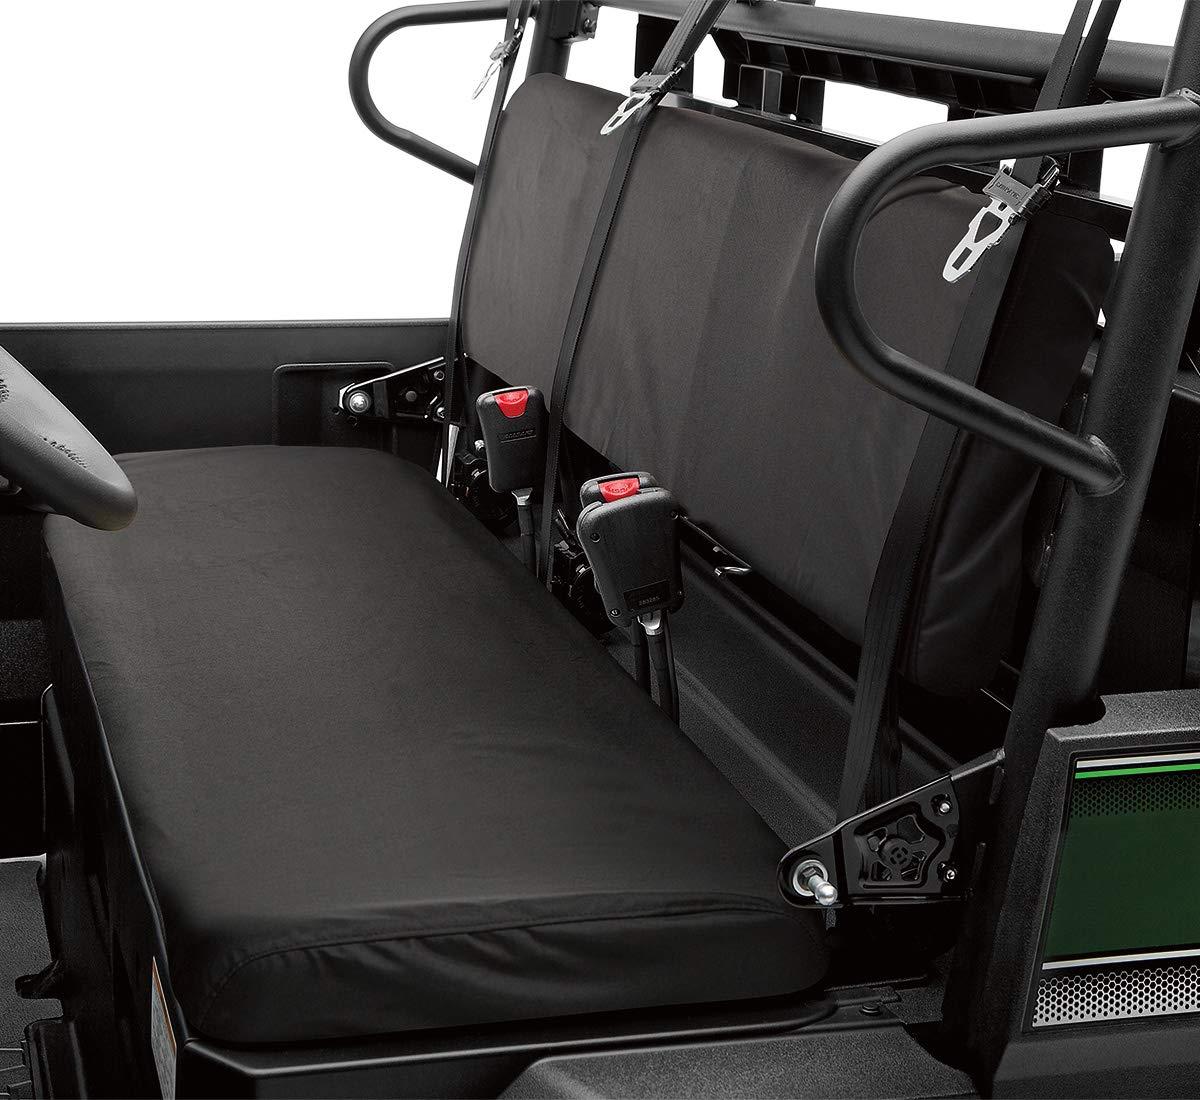 2015-2020 KAWASAKI MULE PRO-FXT FX PRO-DXT DX - PRO SEAT COVER 99994-1151 by Kawasaki